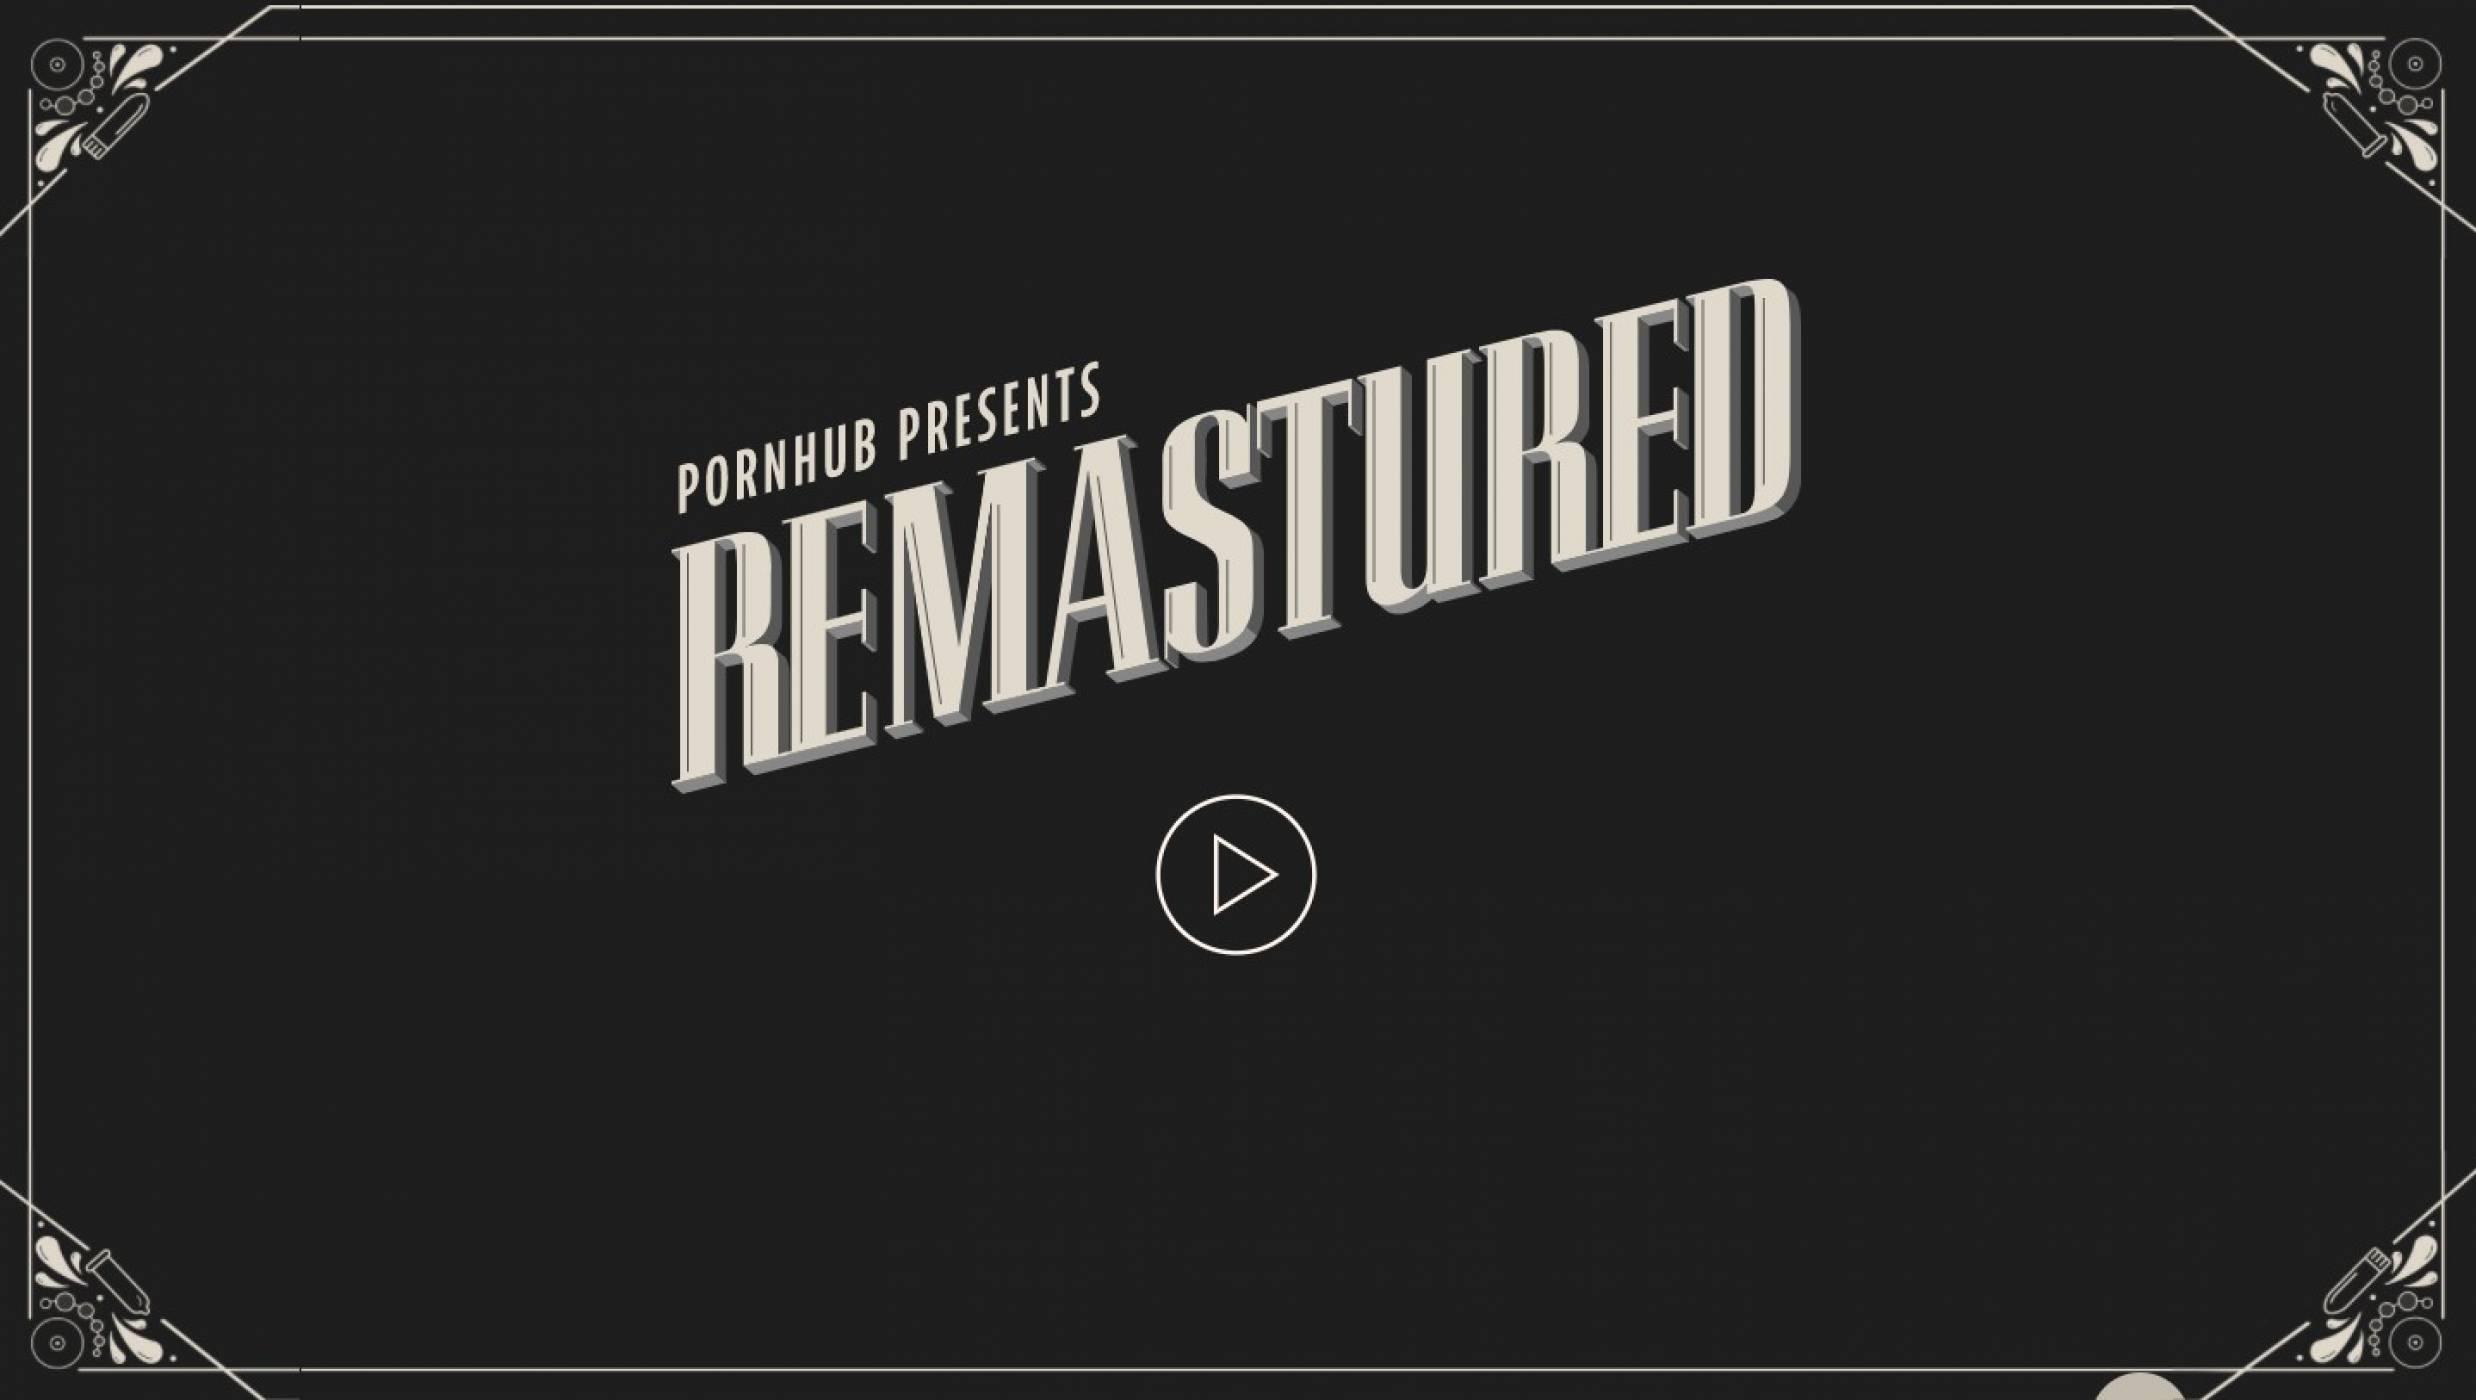 Pornhub Remasters Vintage Porno Films with Artificial Intelligence